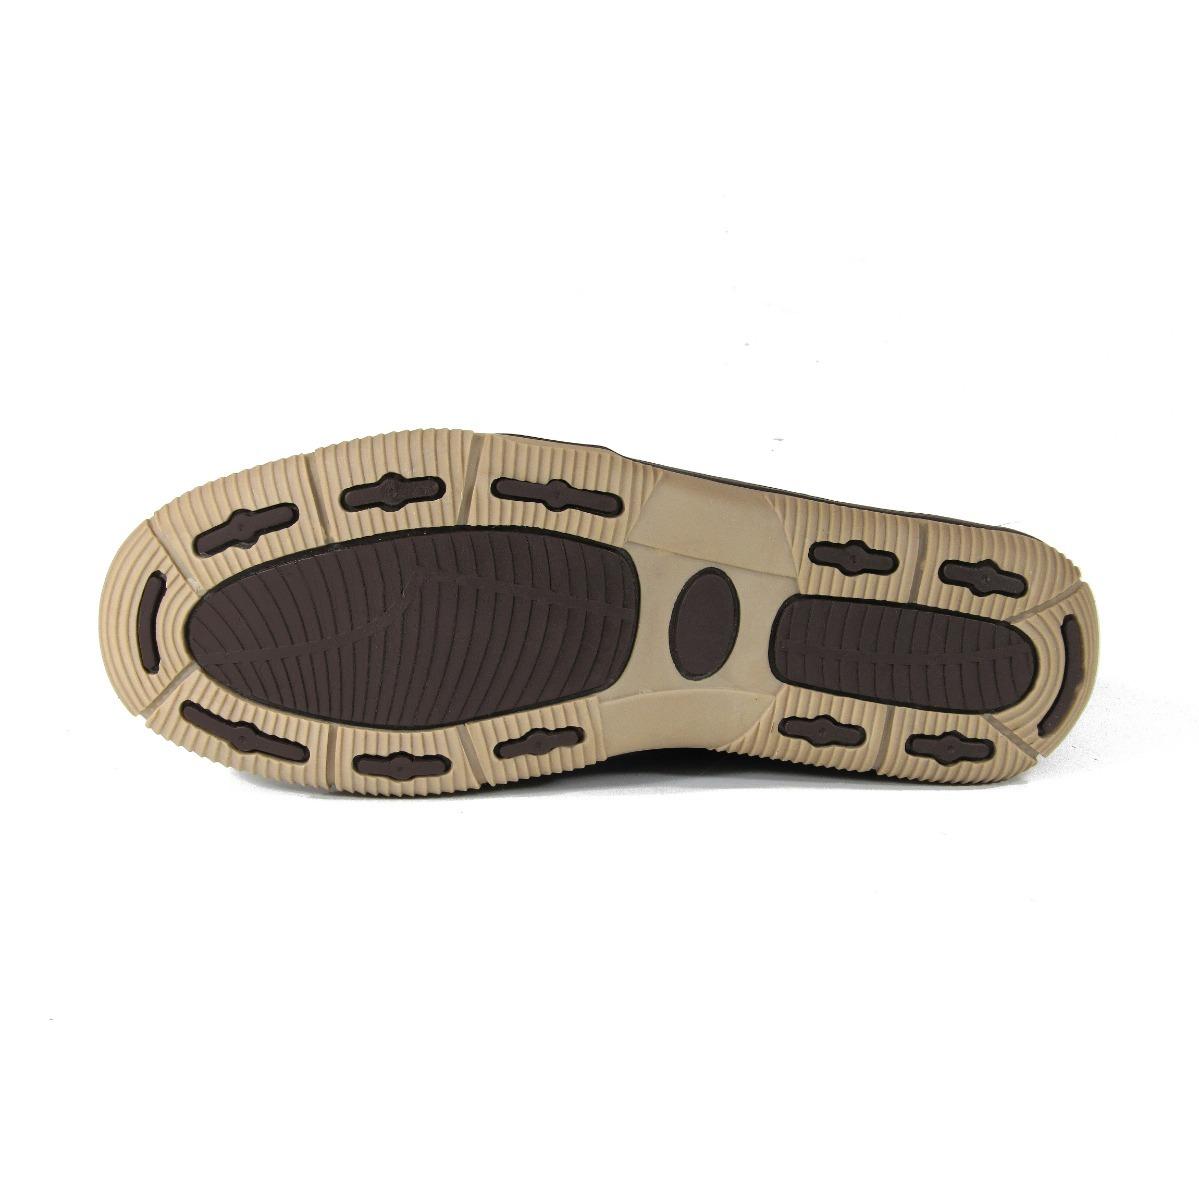 323fab1f8e sapato mocassim sider sapatilha masculino couro marrom. Carregando zoom.